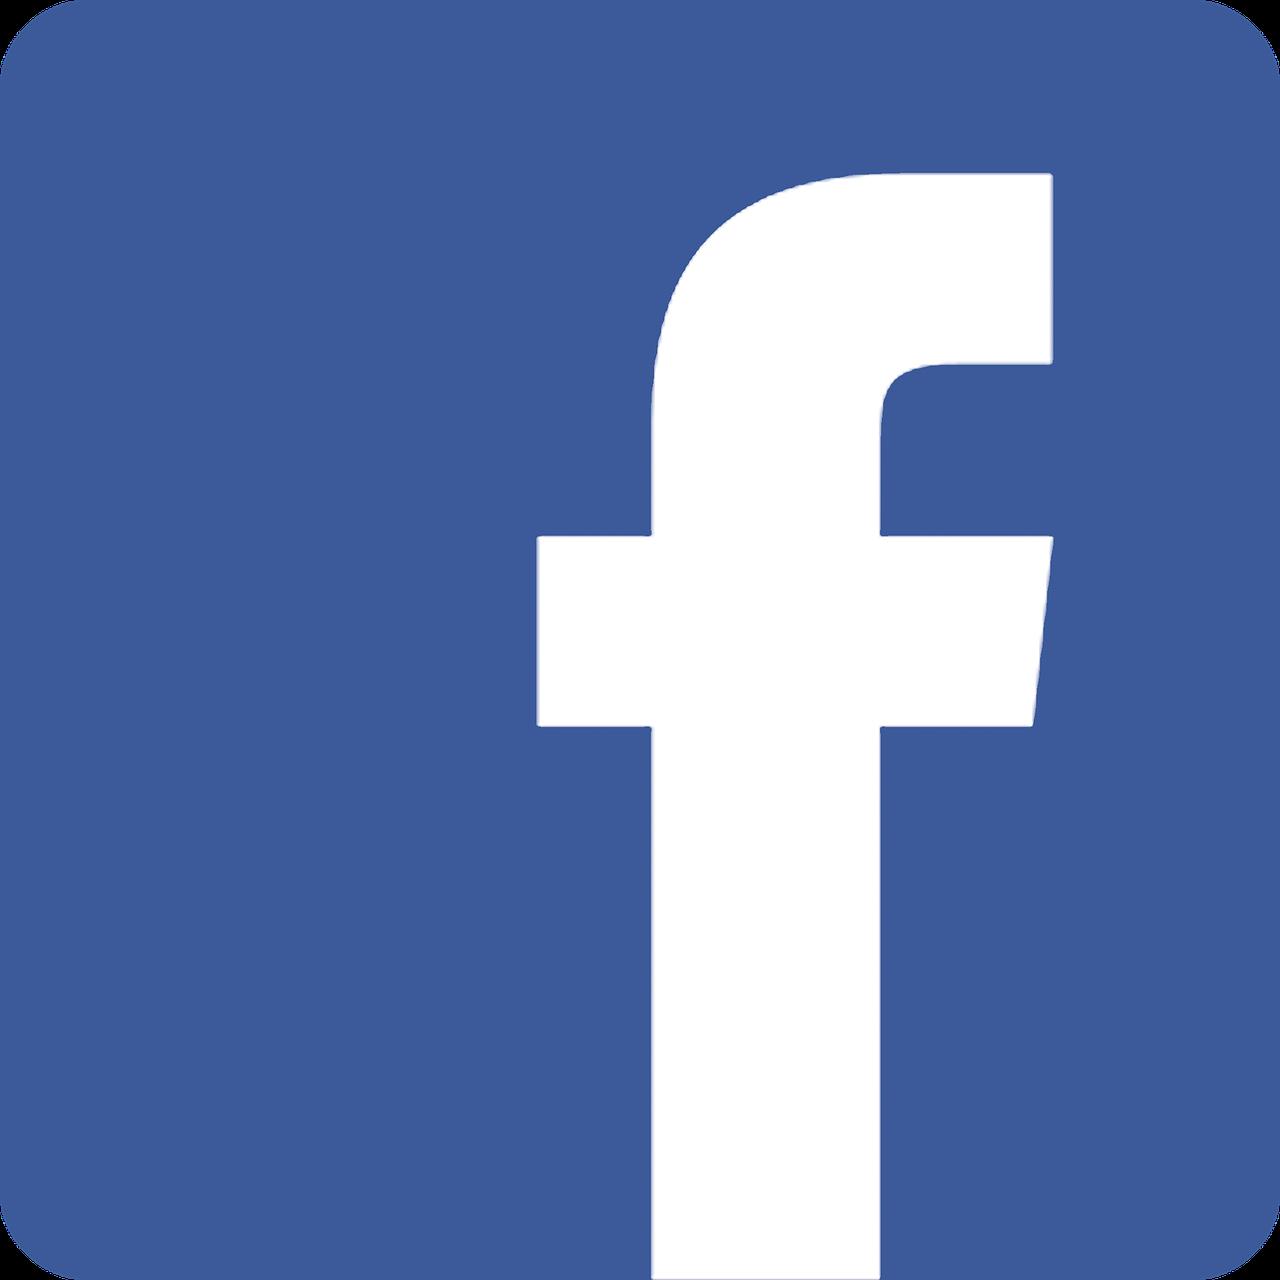 facebook-770688_1280.png